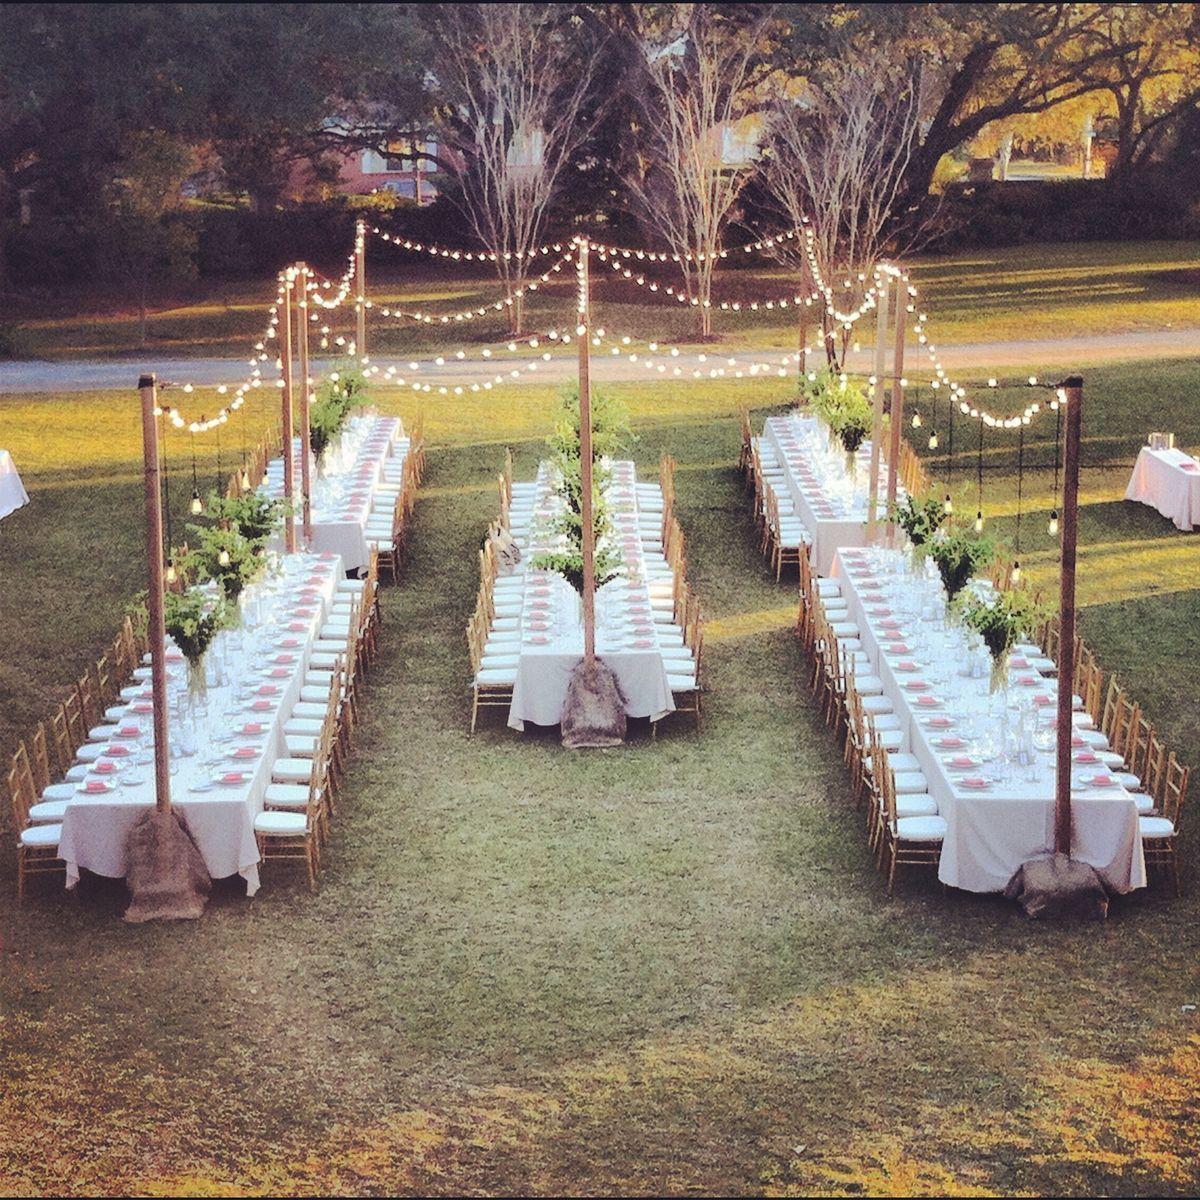 Wedding Backyard Reception Backyard Wedding Outdoor Wedding Backyard garden wedding reception